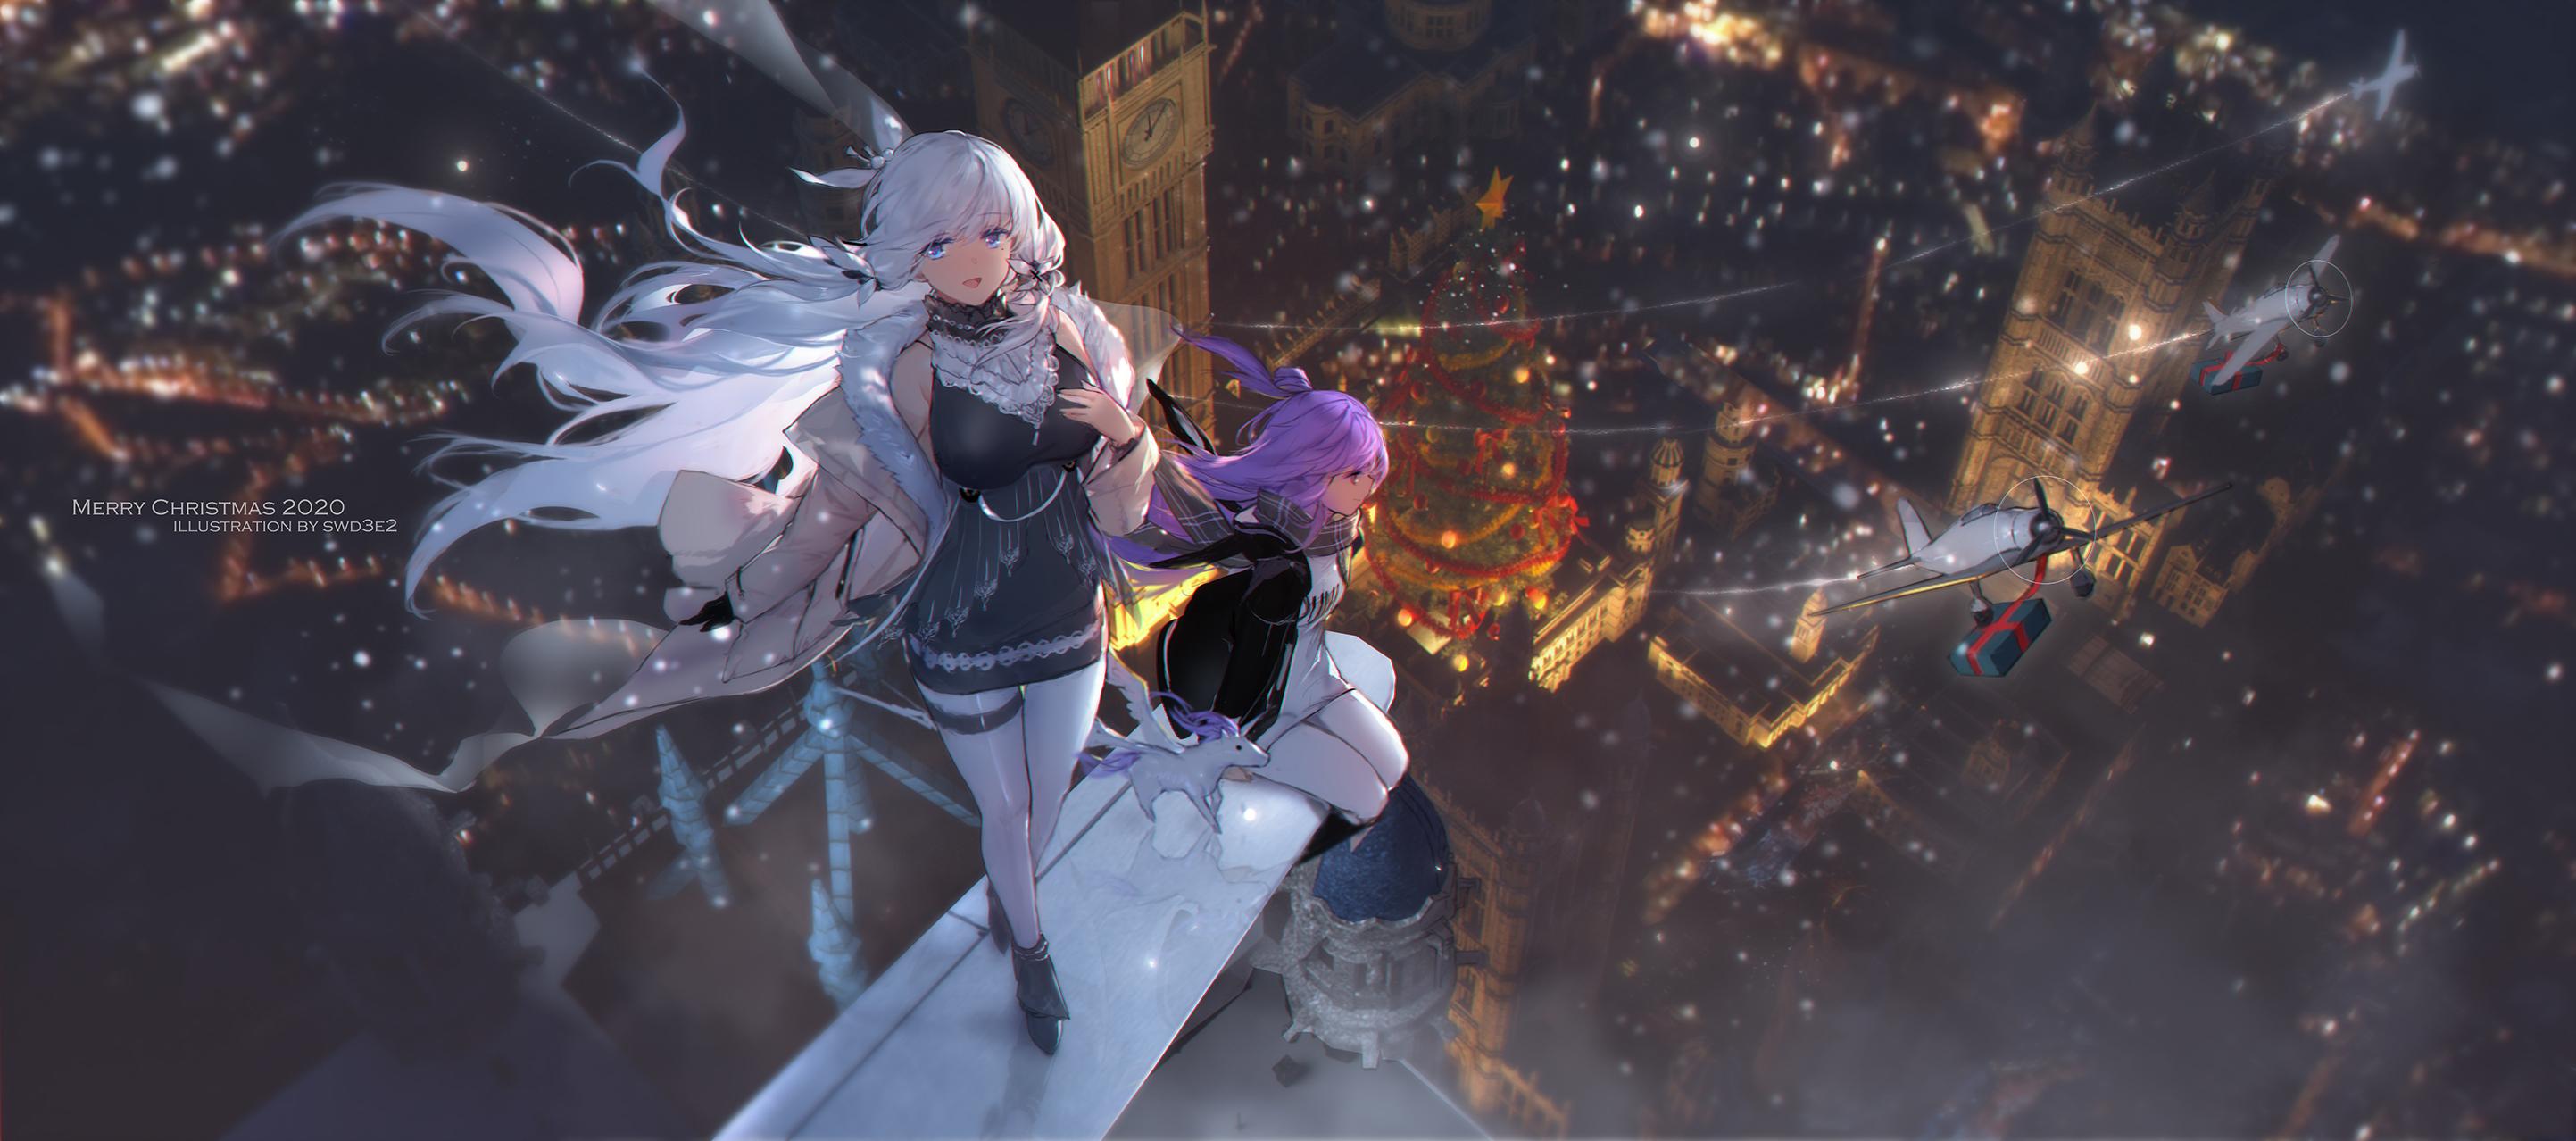 Anime 2886x1278 Azur Lane Illustrious (Azur Lane) Unicorn (Azur Lane) anime girls swd3e2 Christmas cityscape